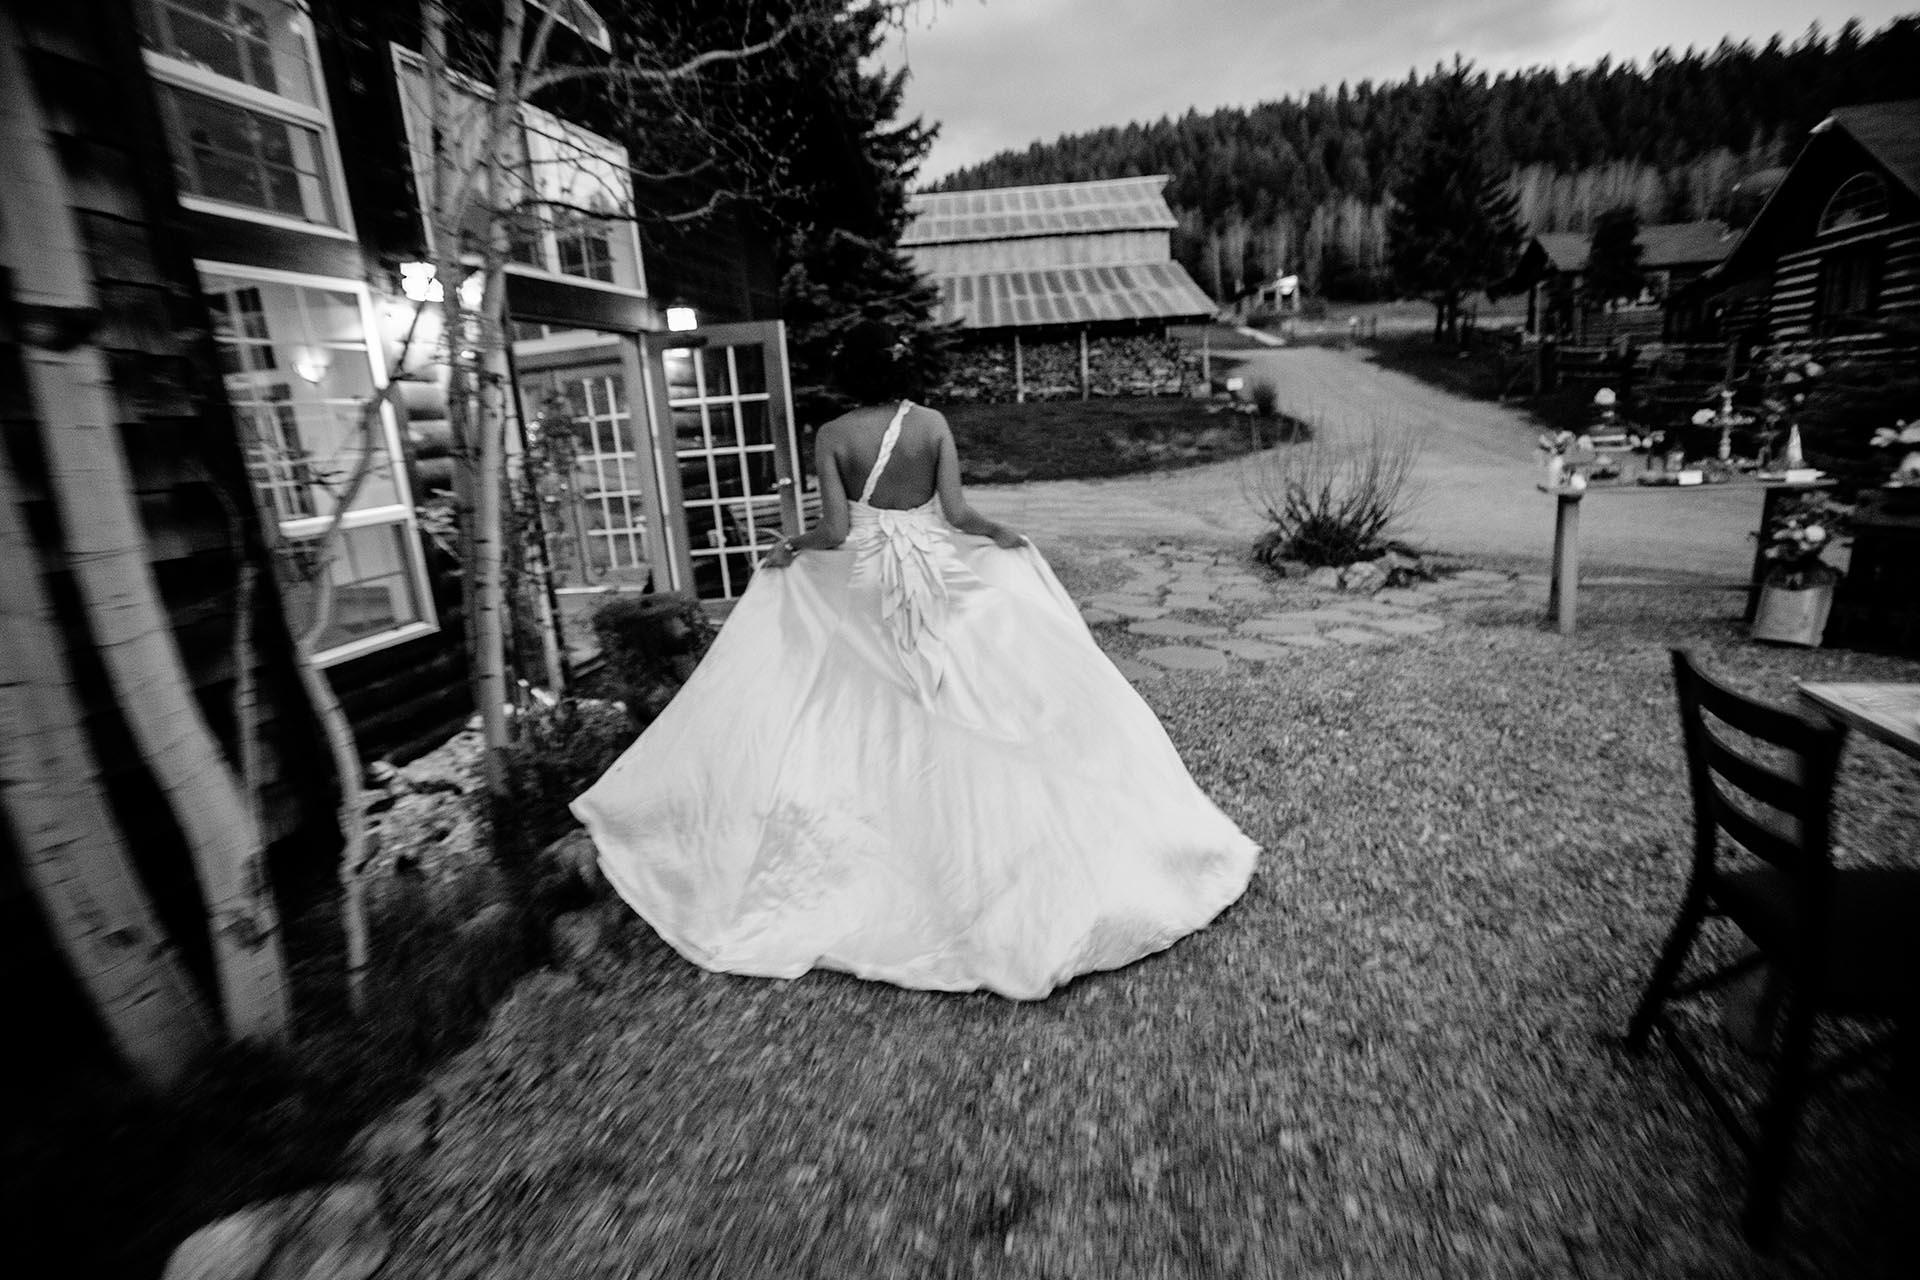 Colorado-Weed-Wedding-Hemp-Silk-Dress-2